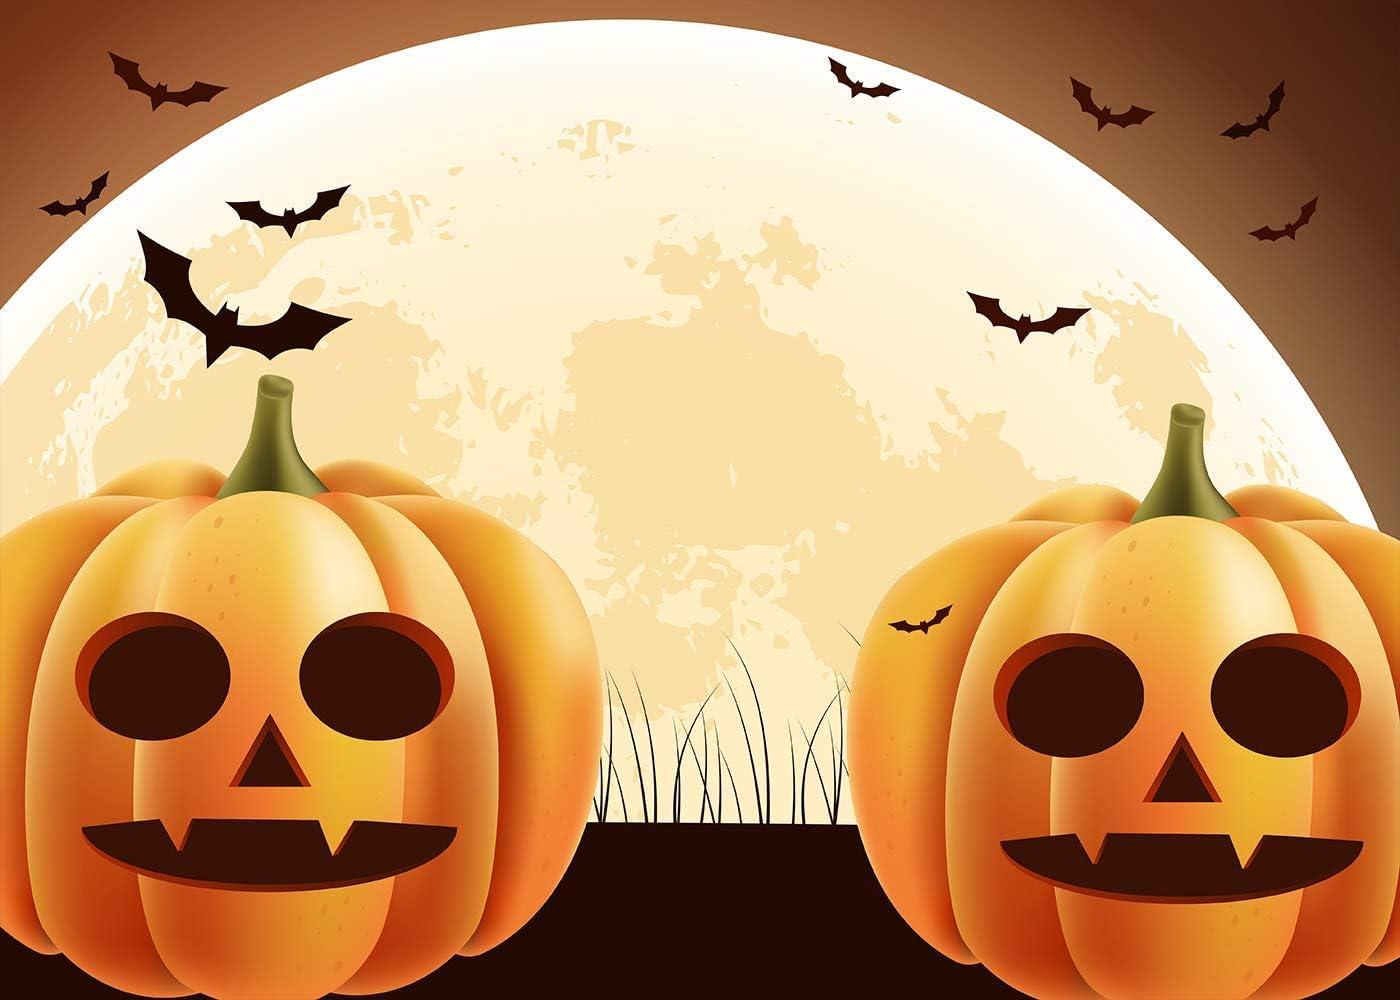 10x6.5ft Halloween Pumpkin Photography Backdrop Background Photo Shooting Props DSFU085